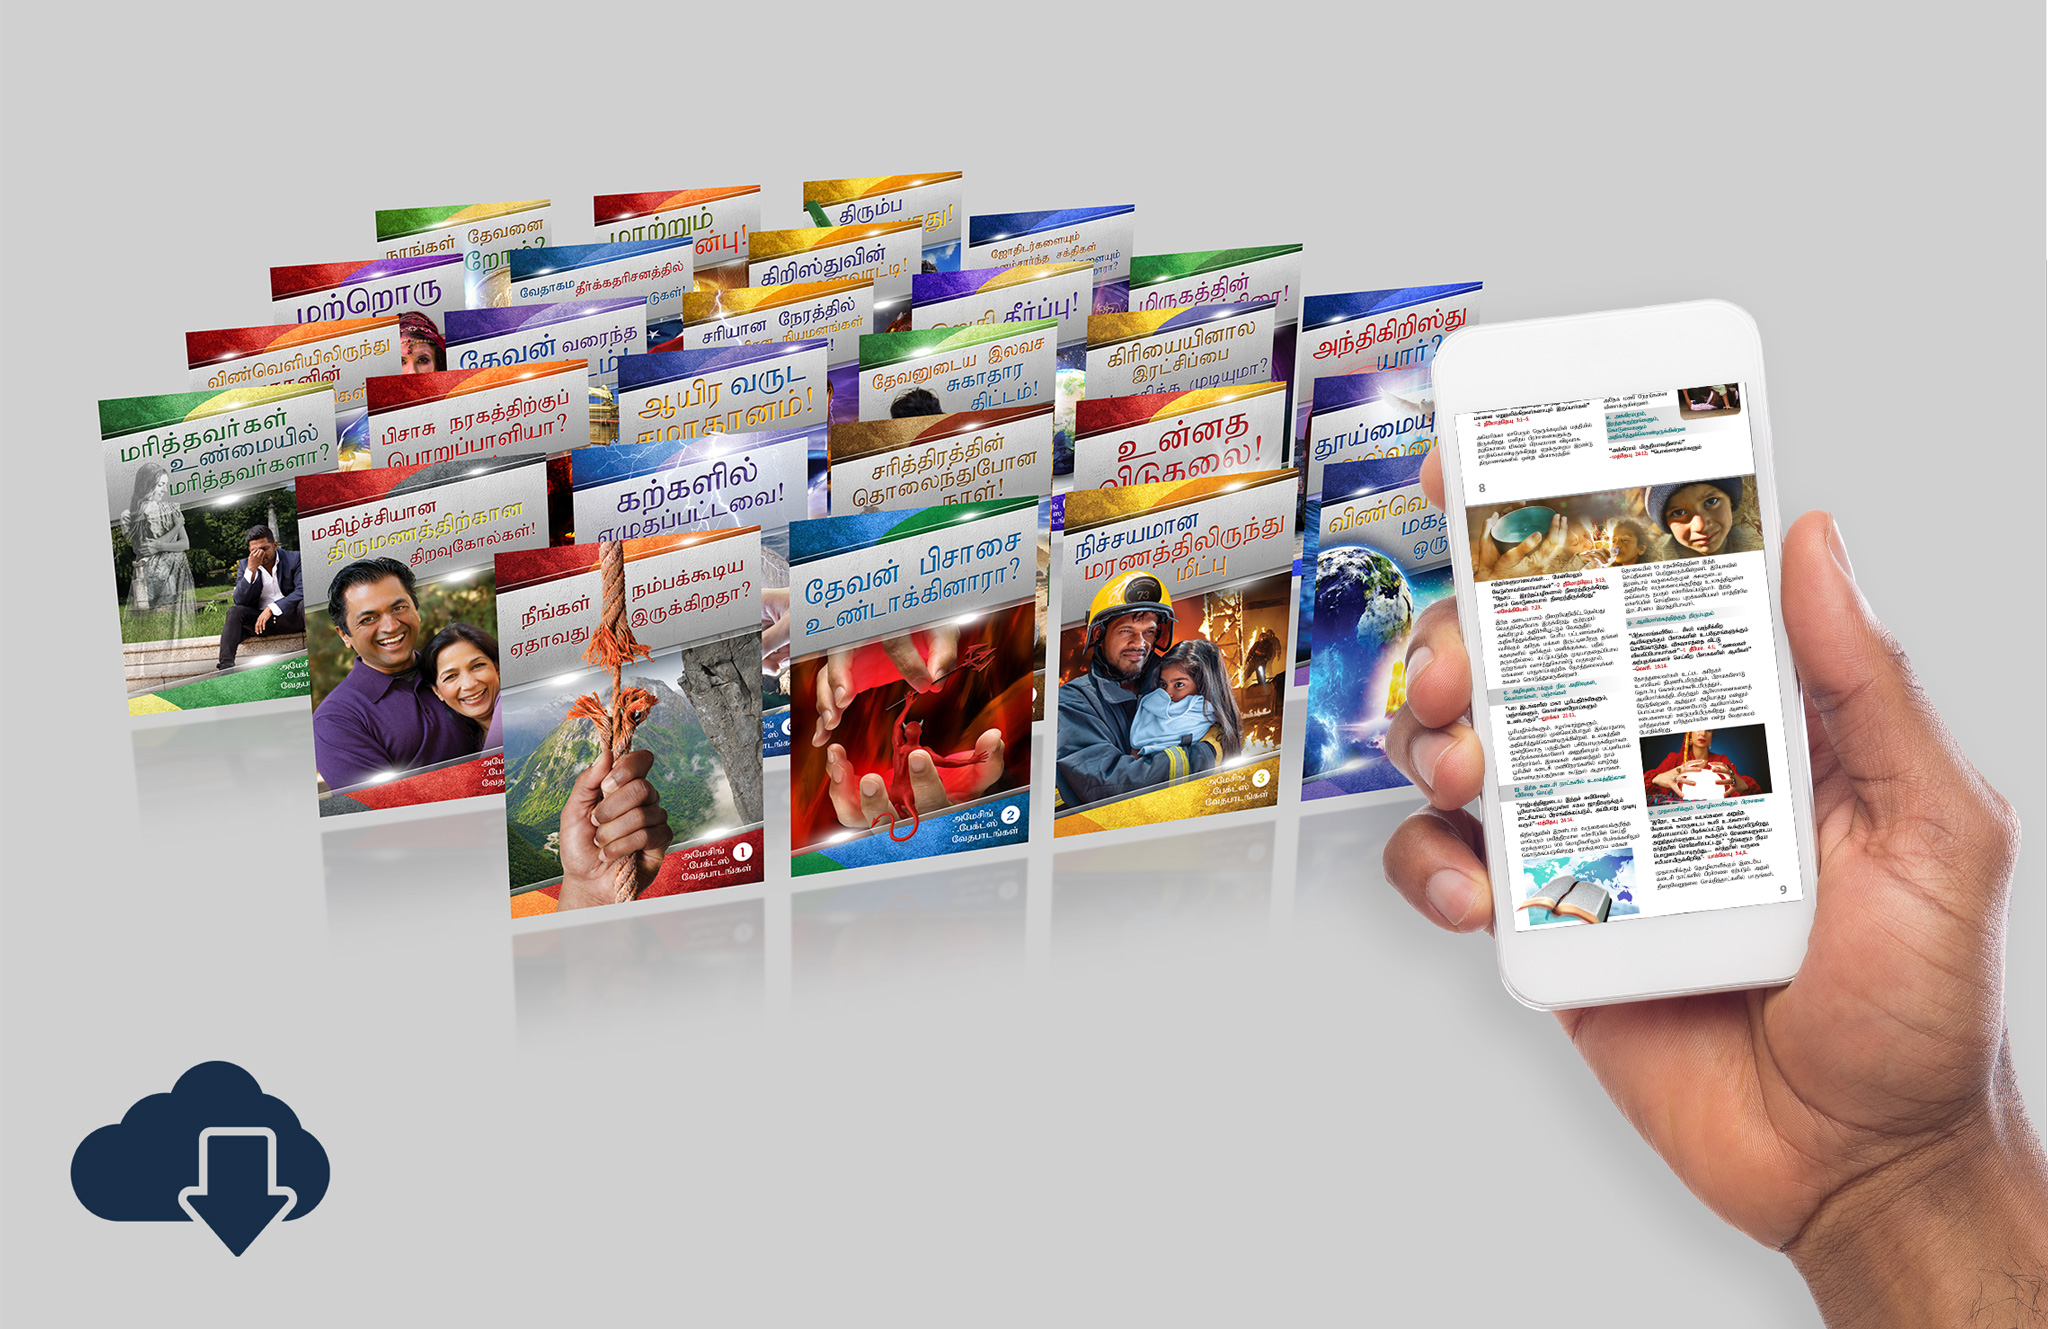 Study-Guide-Tamil-Digital-Downloads